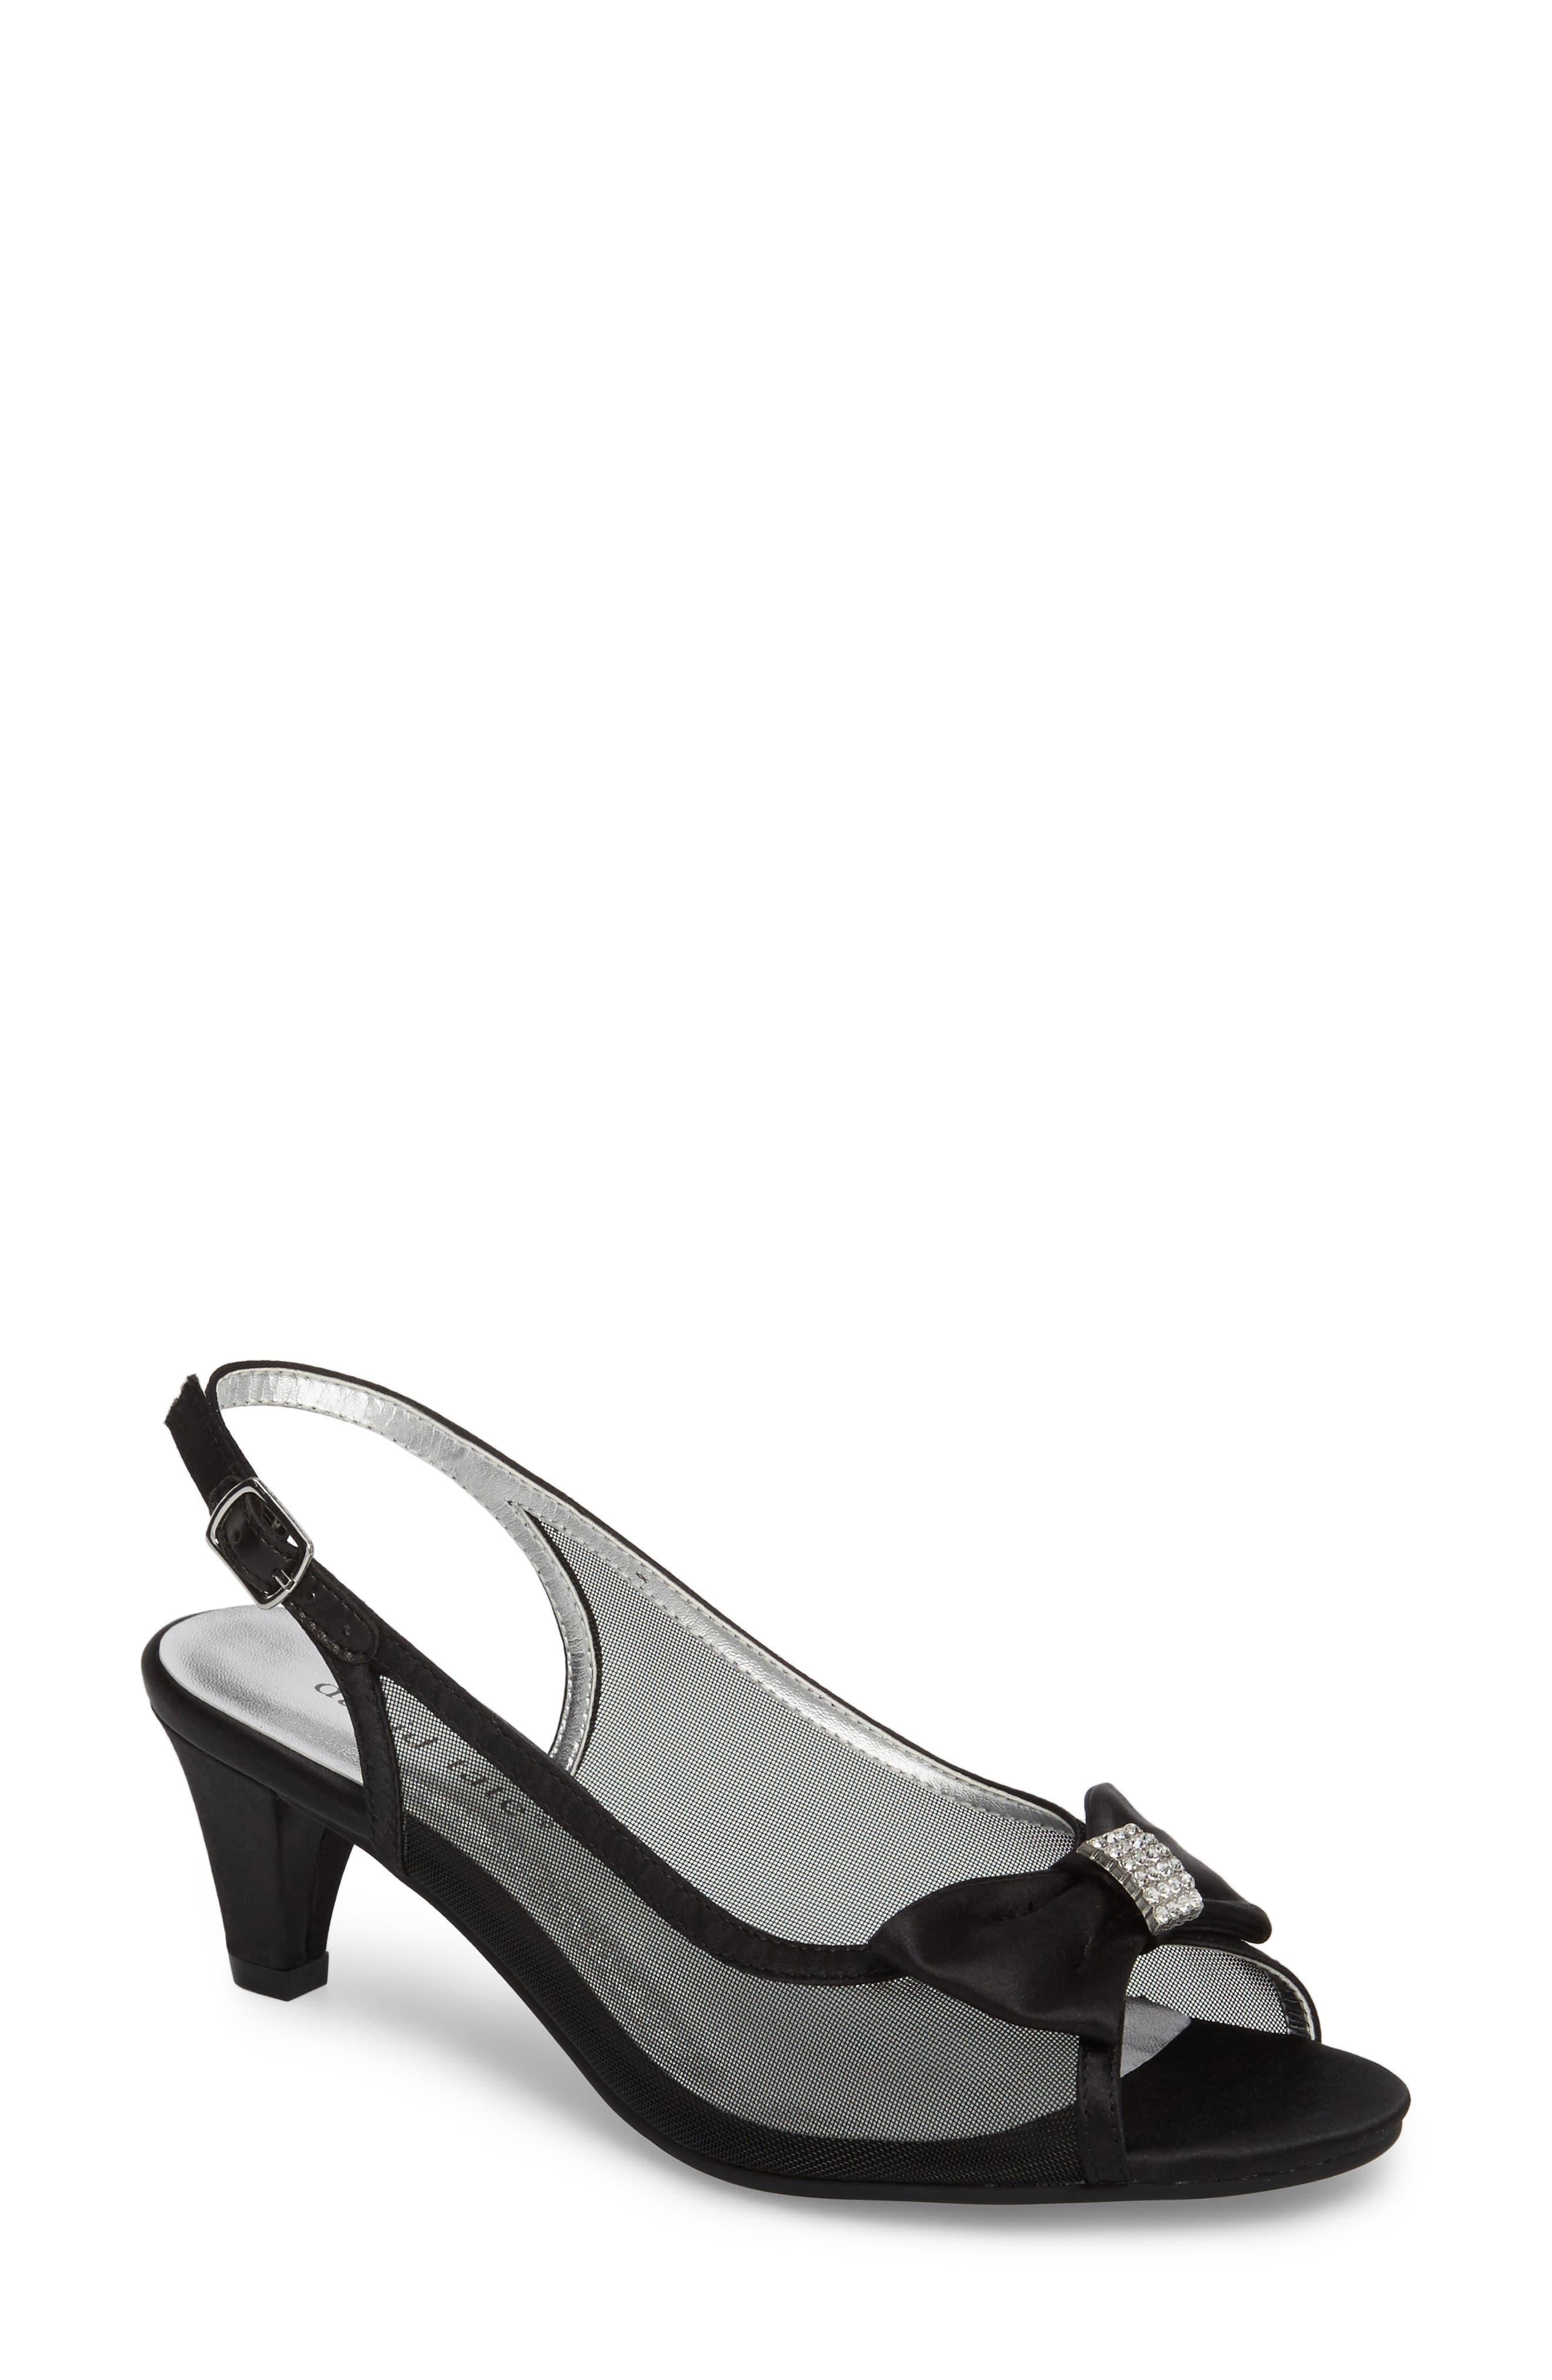 Foxy Slingback Sandal,                         Main,                         color, BLACK SATIN